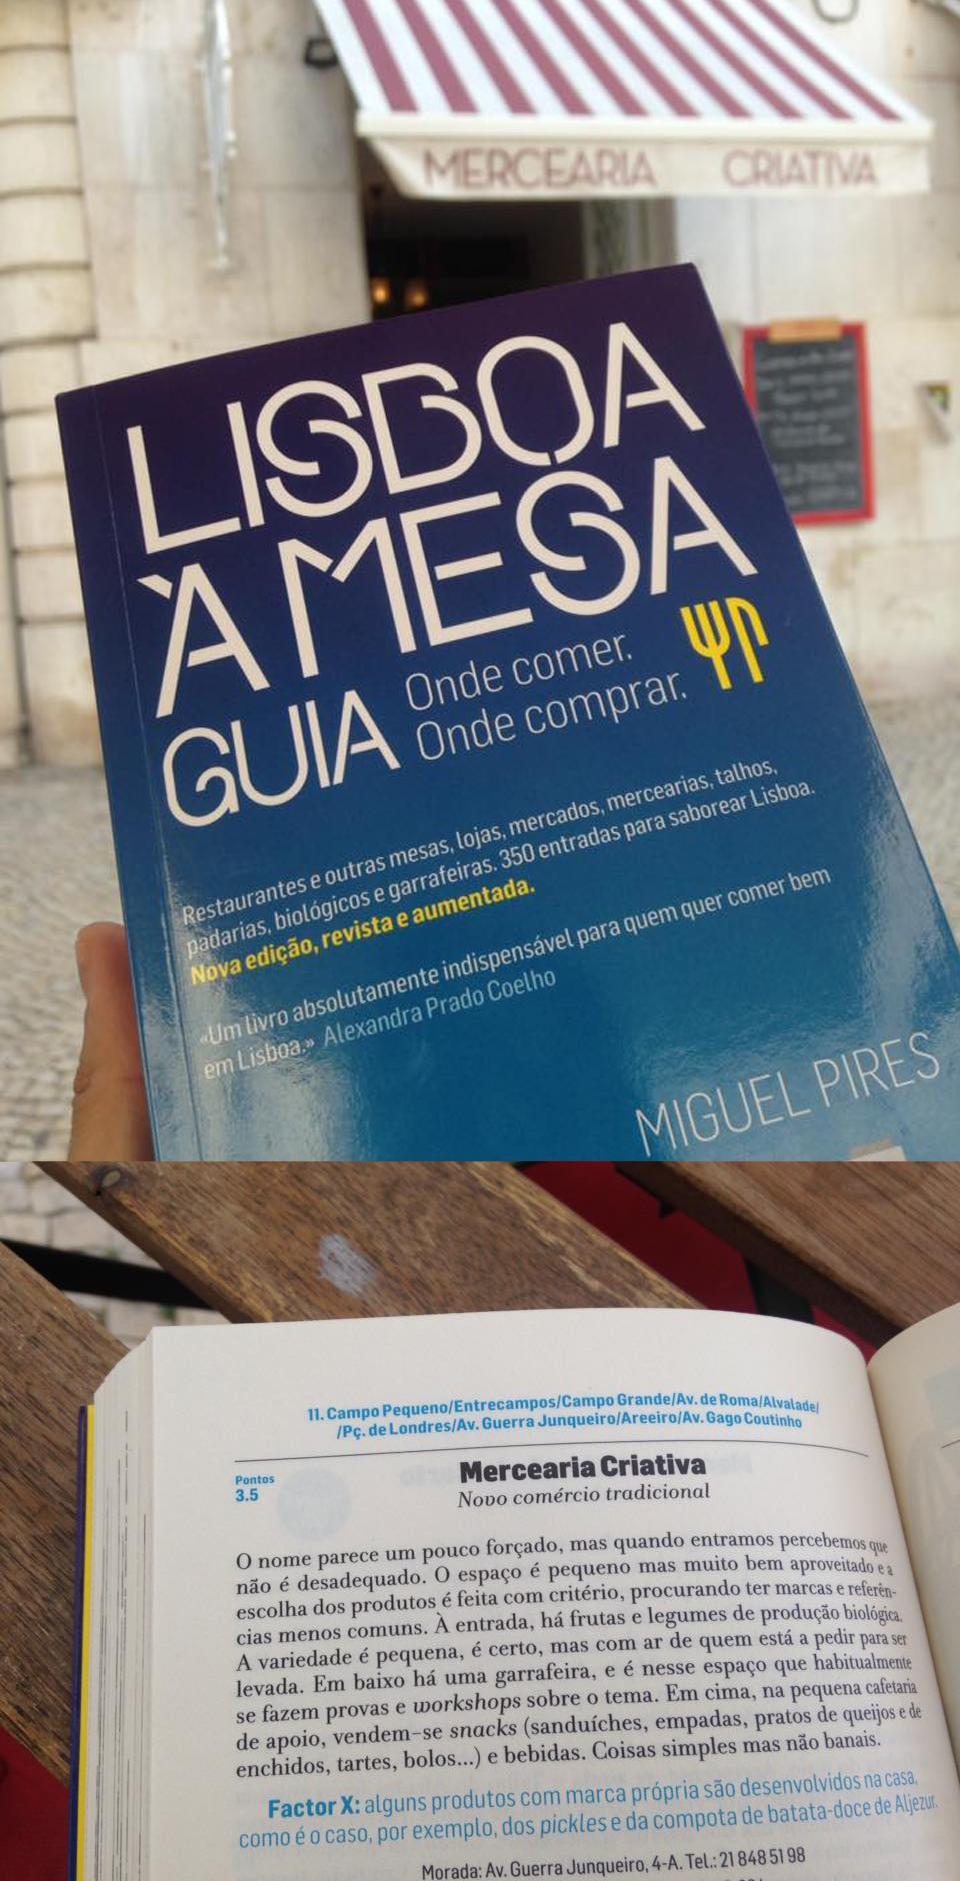 GUIA LISBOA À MESA · 06/2016